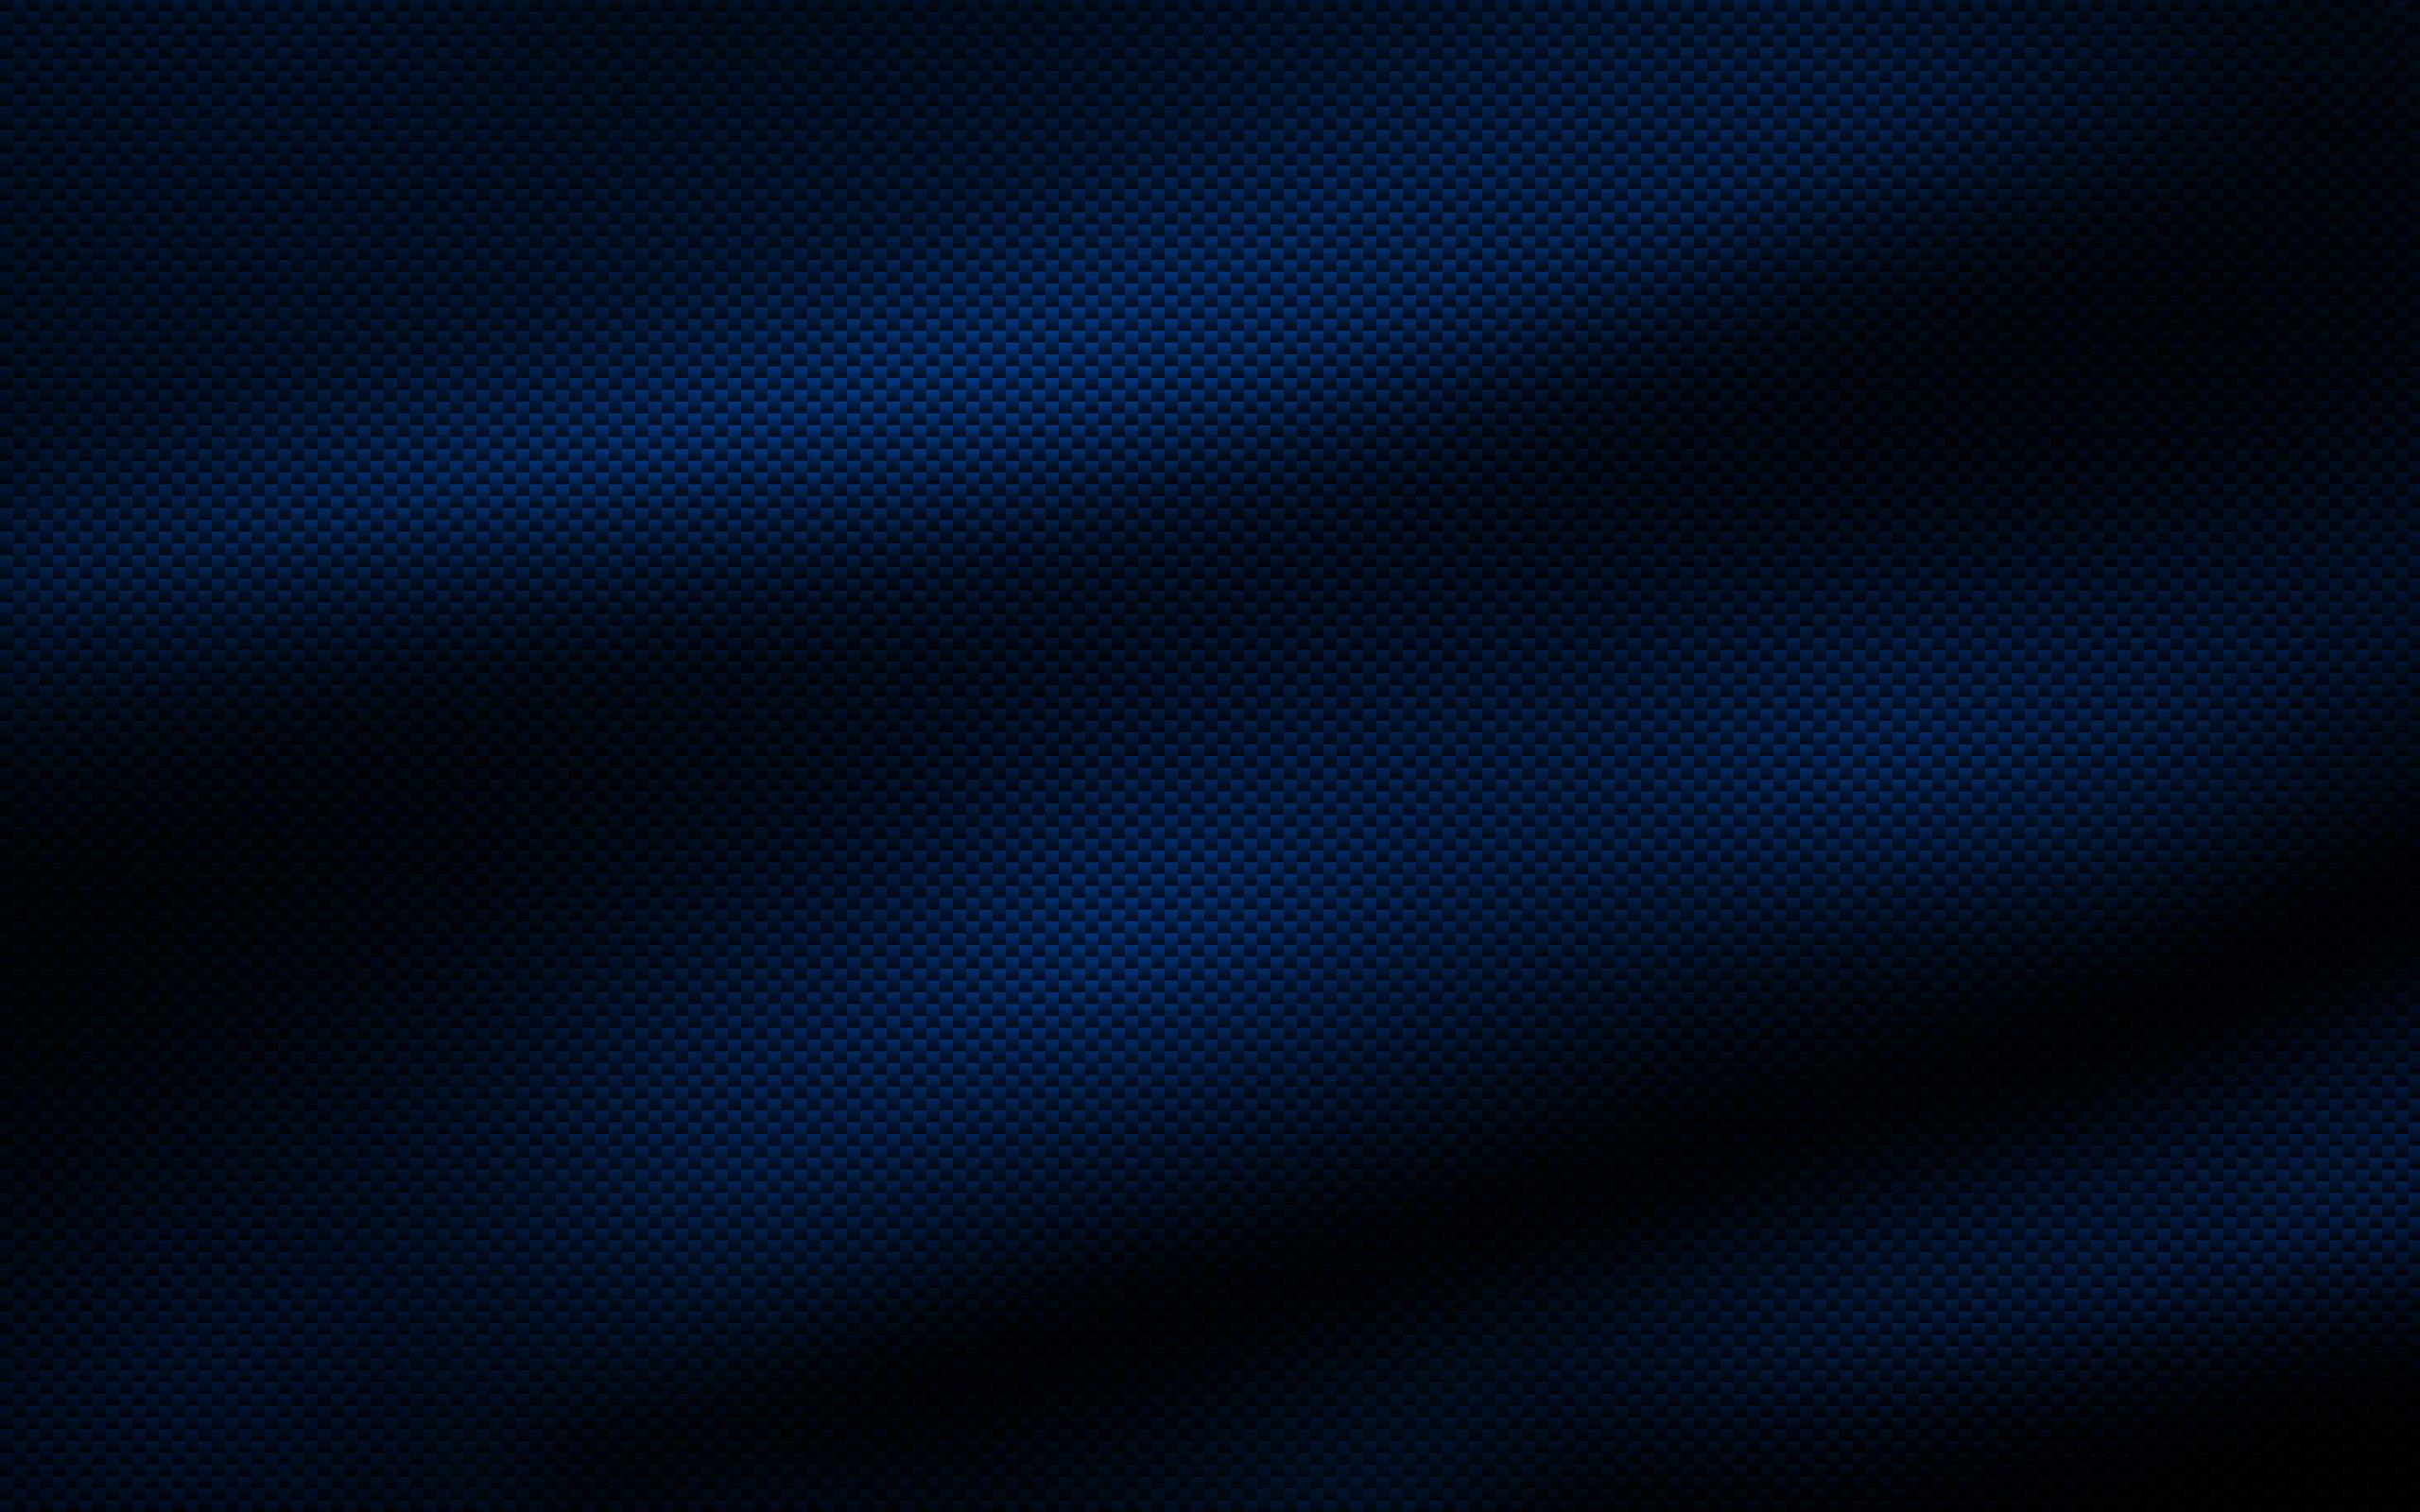 wallpaper hd dlwallhd blue - photo #29